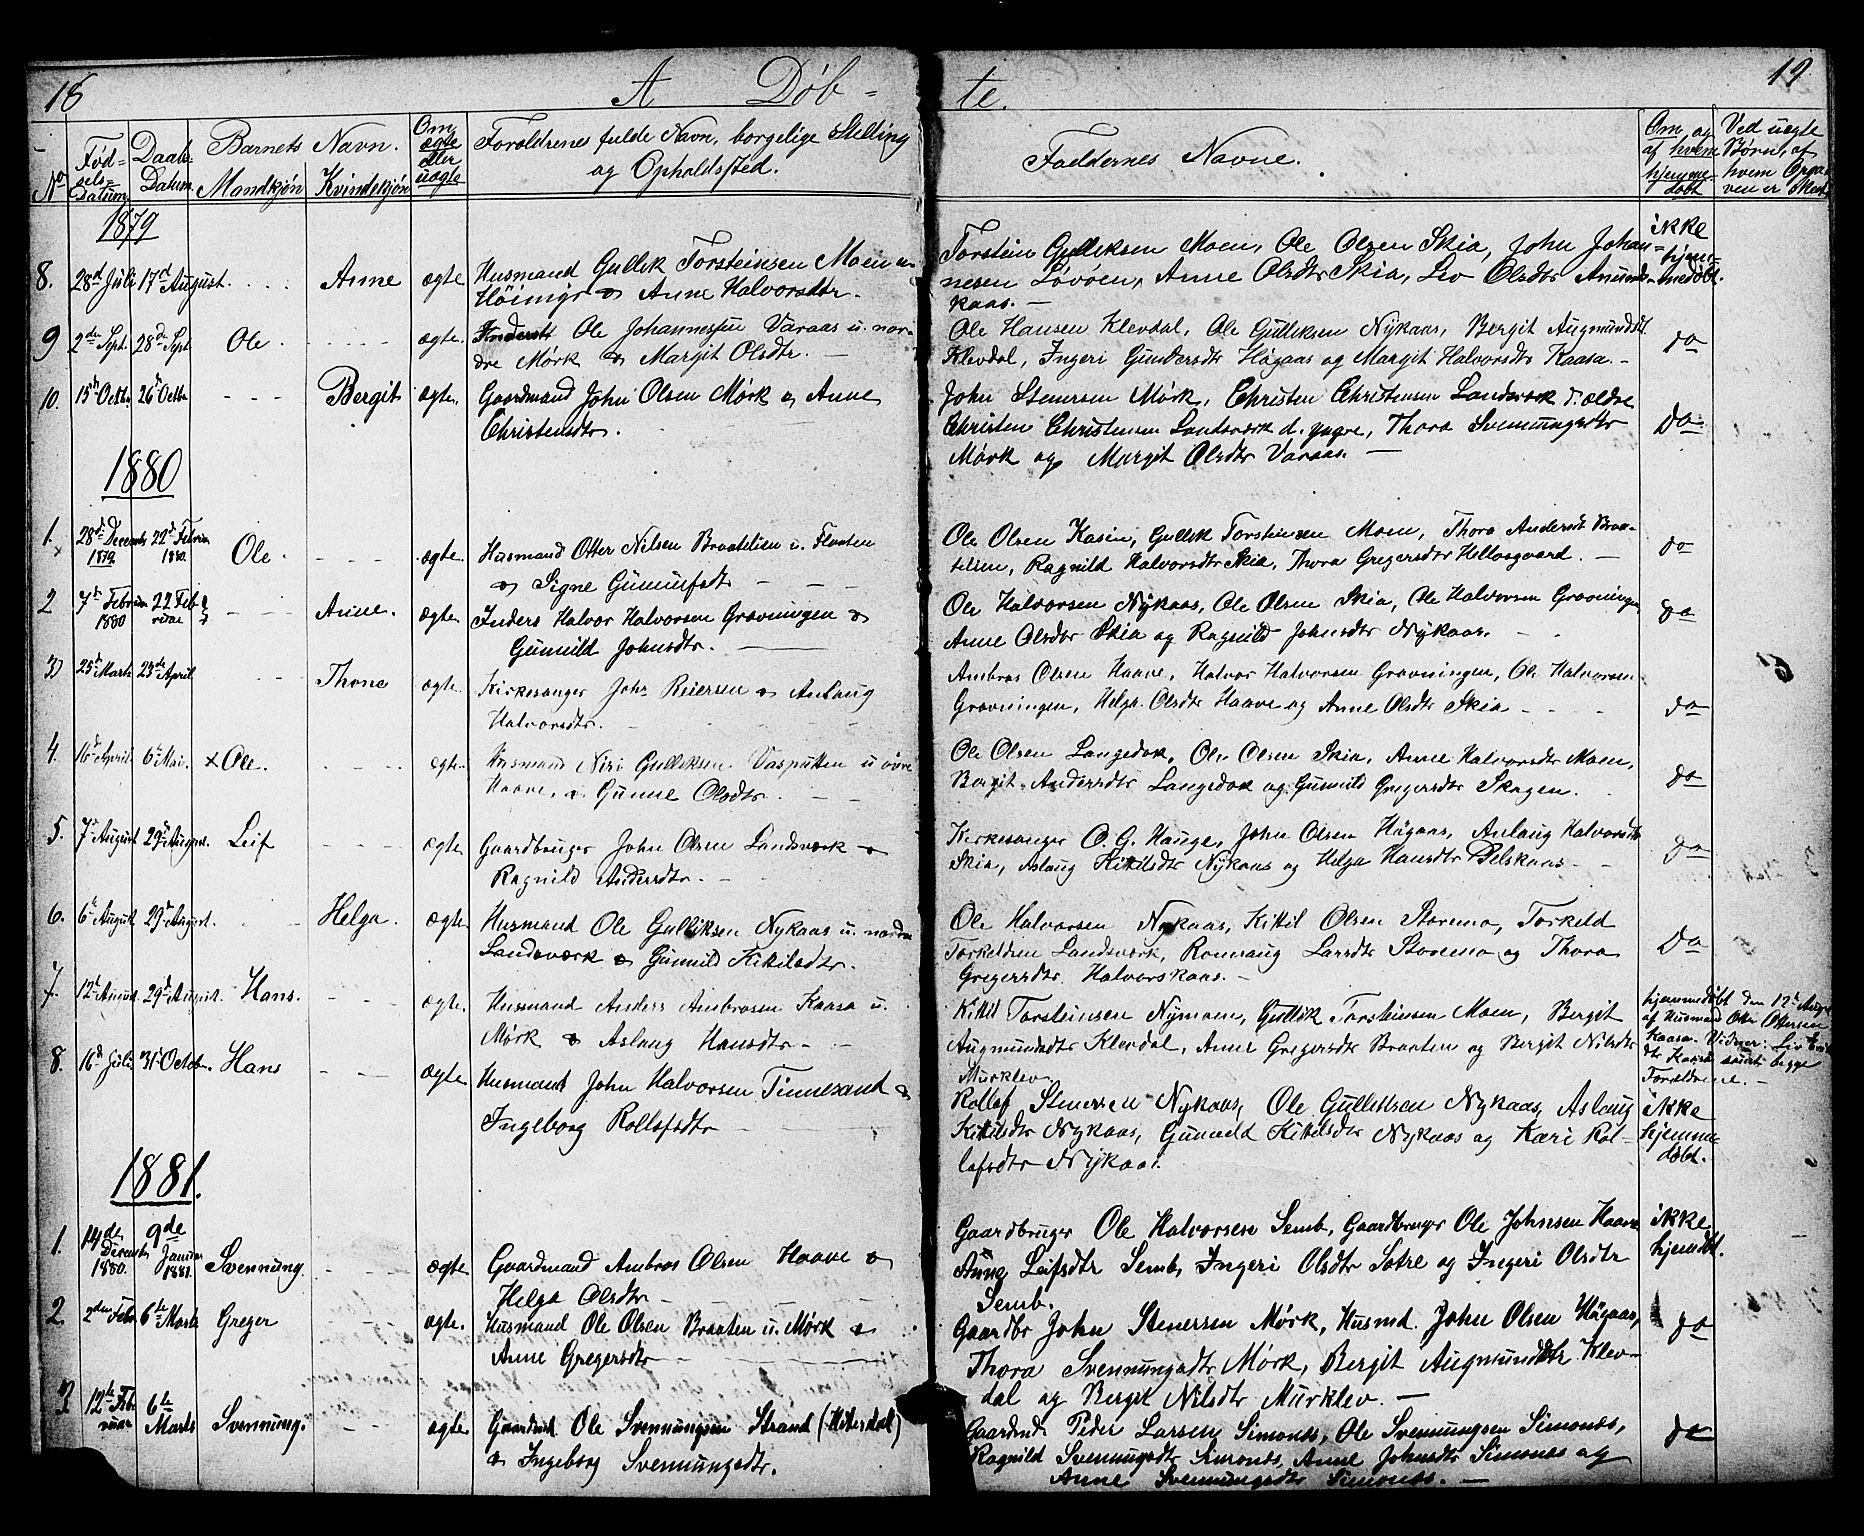 SAKO, Heddal kirkebøker, G/Gb/L0001: Klokkerbok nr. II 1, 1866-1887, s. 18-19